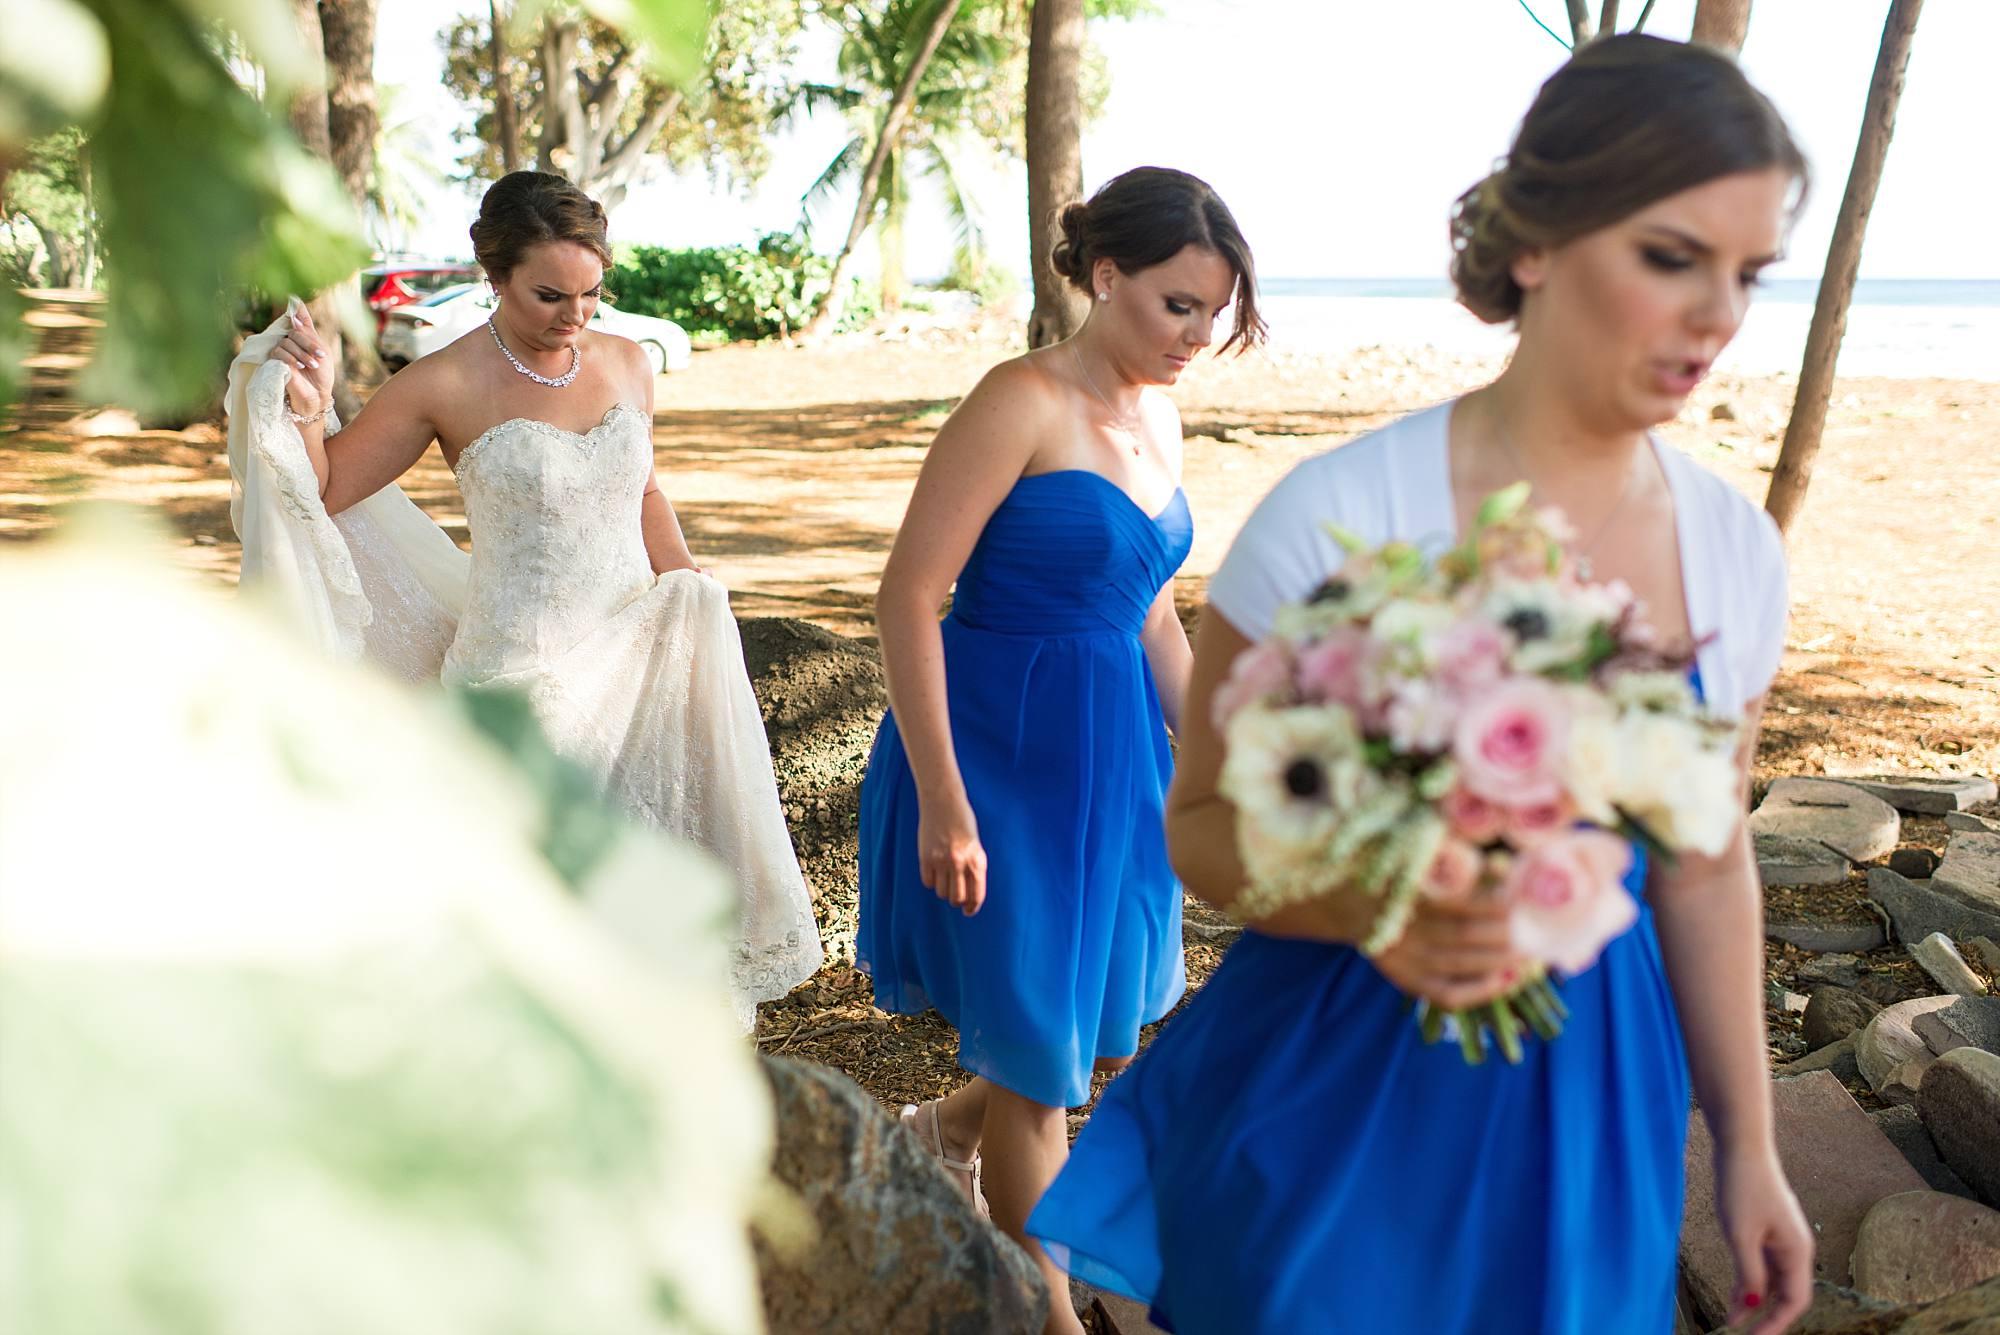 Bride and bridesmaids walking to ceremony